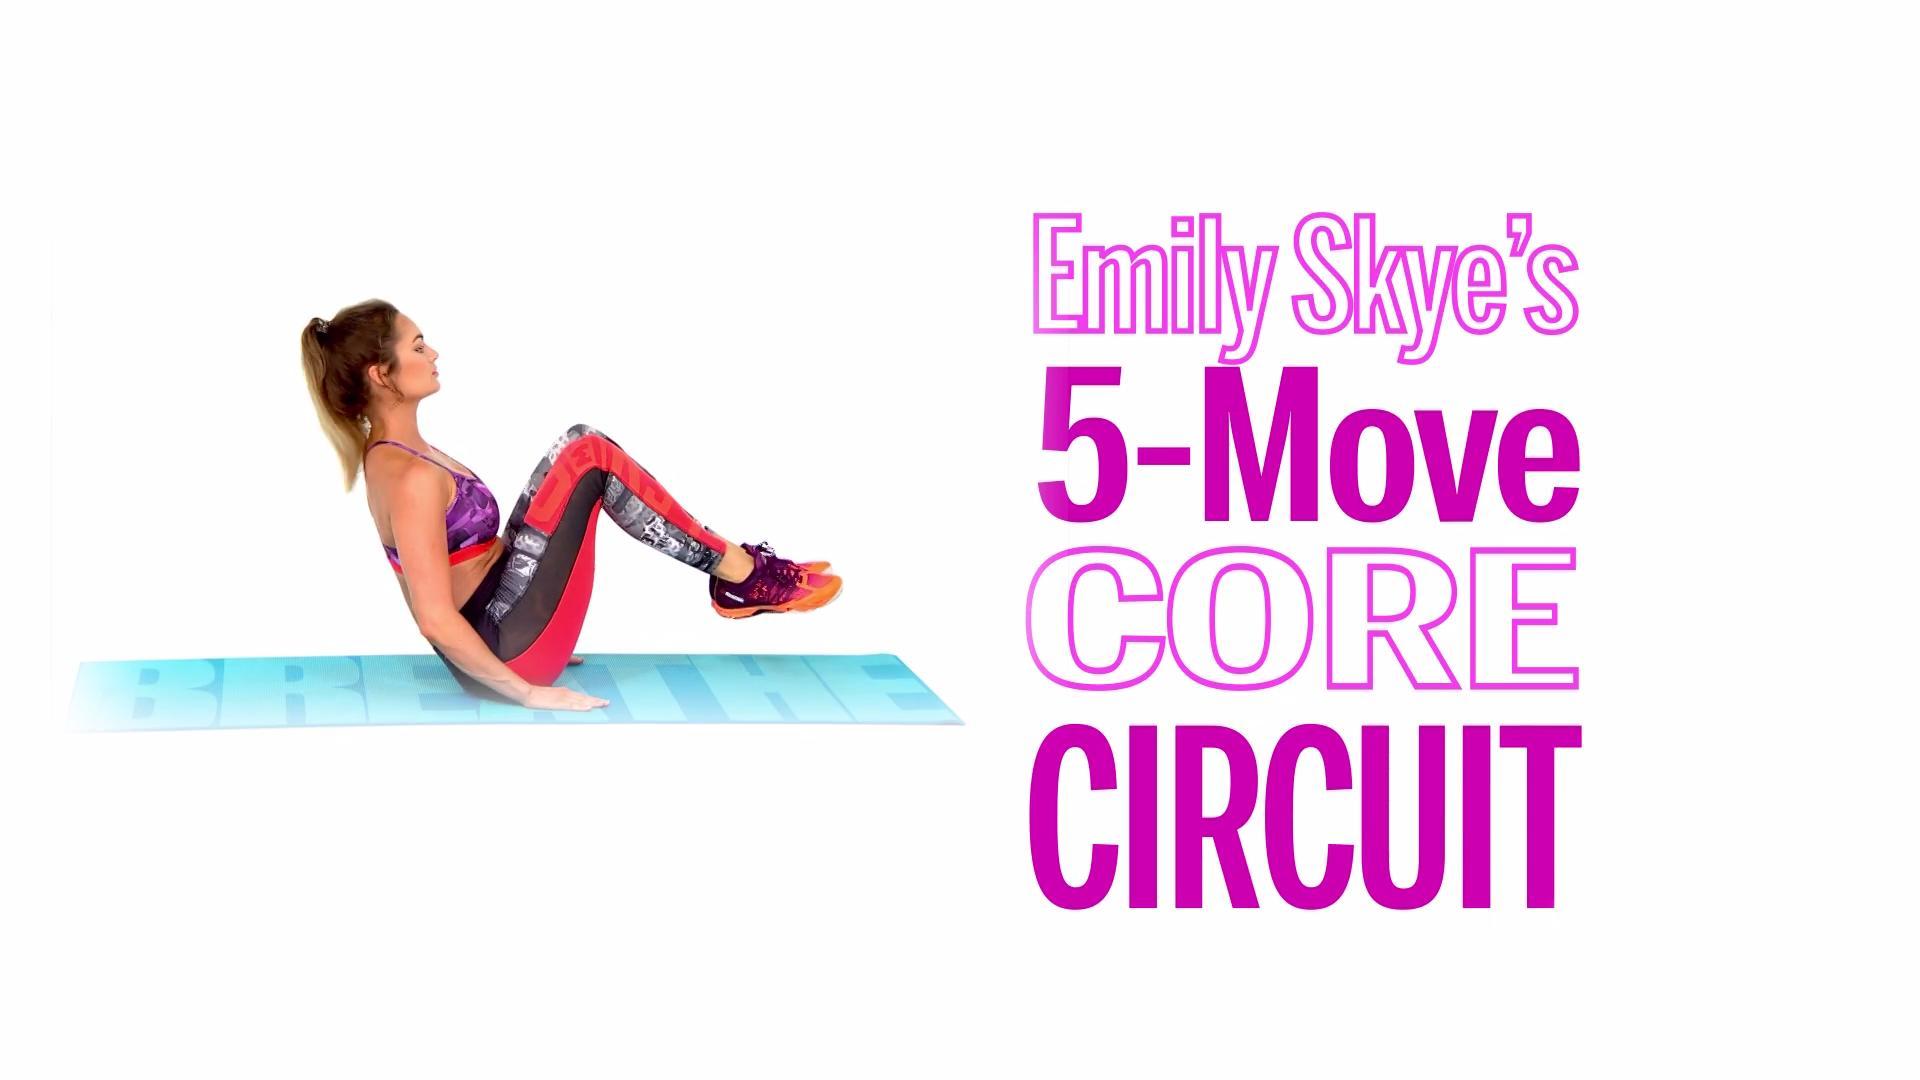 Emily Skye's 5-Move Core Circuit